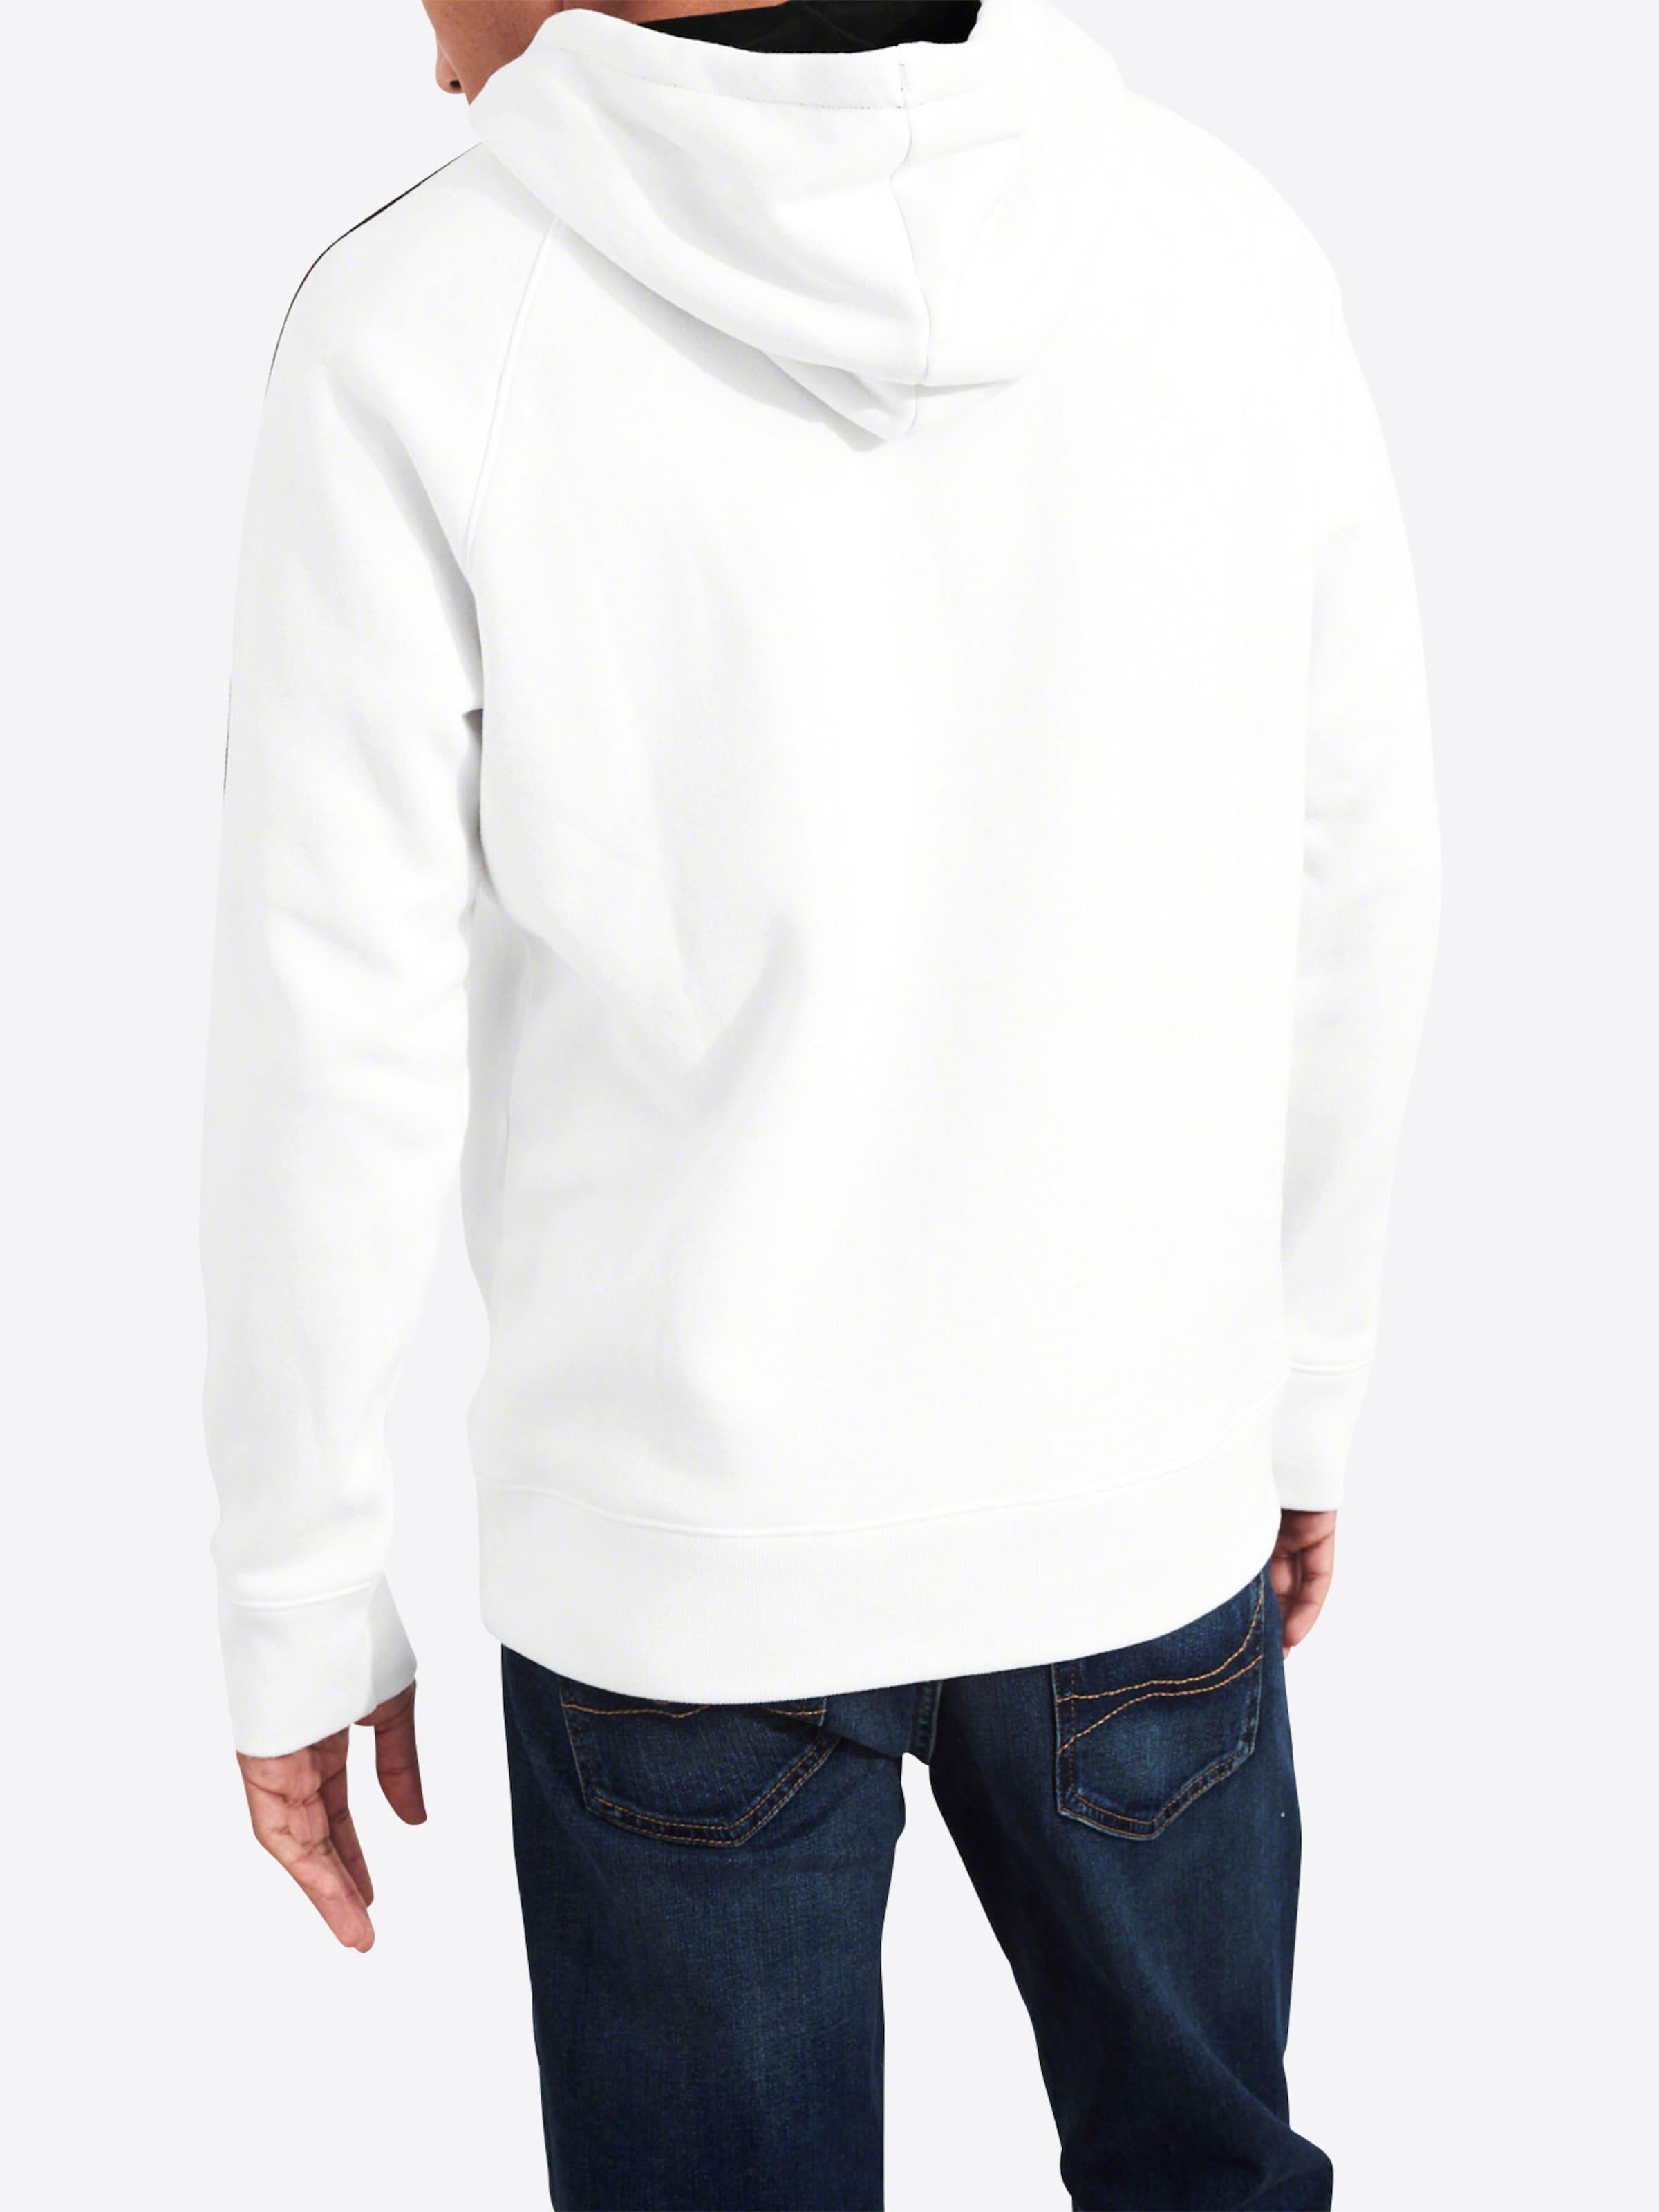 Blanc En Sweat Shirt Lj543ar Hollister nwOk80P